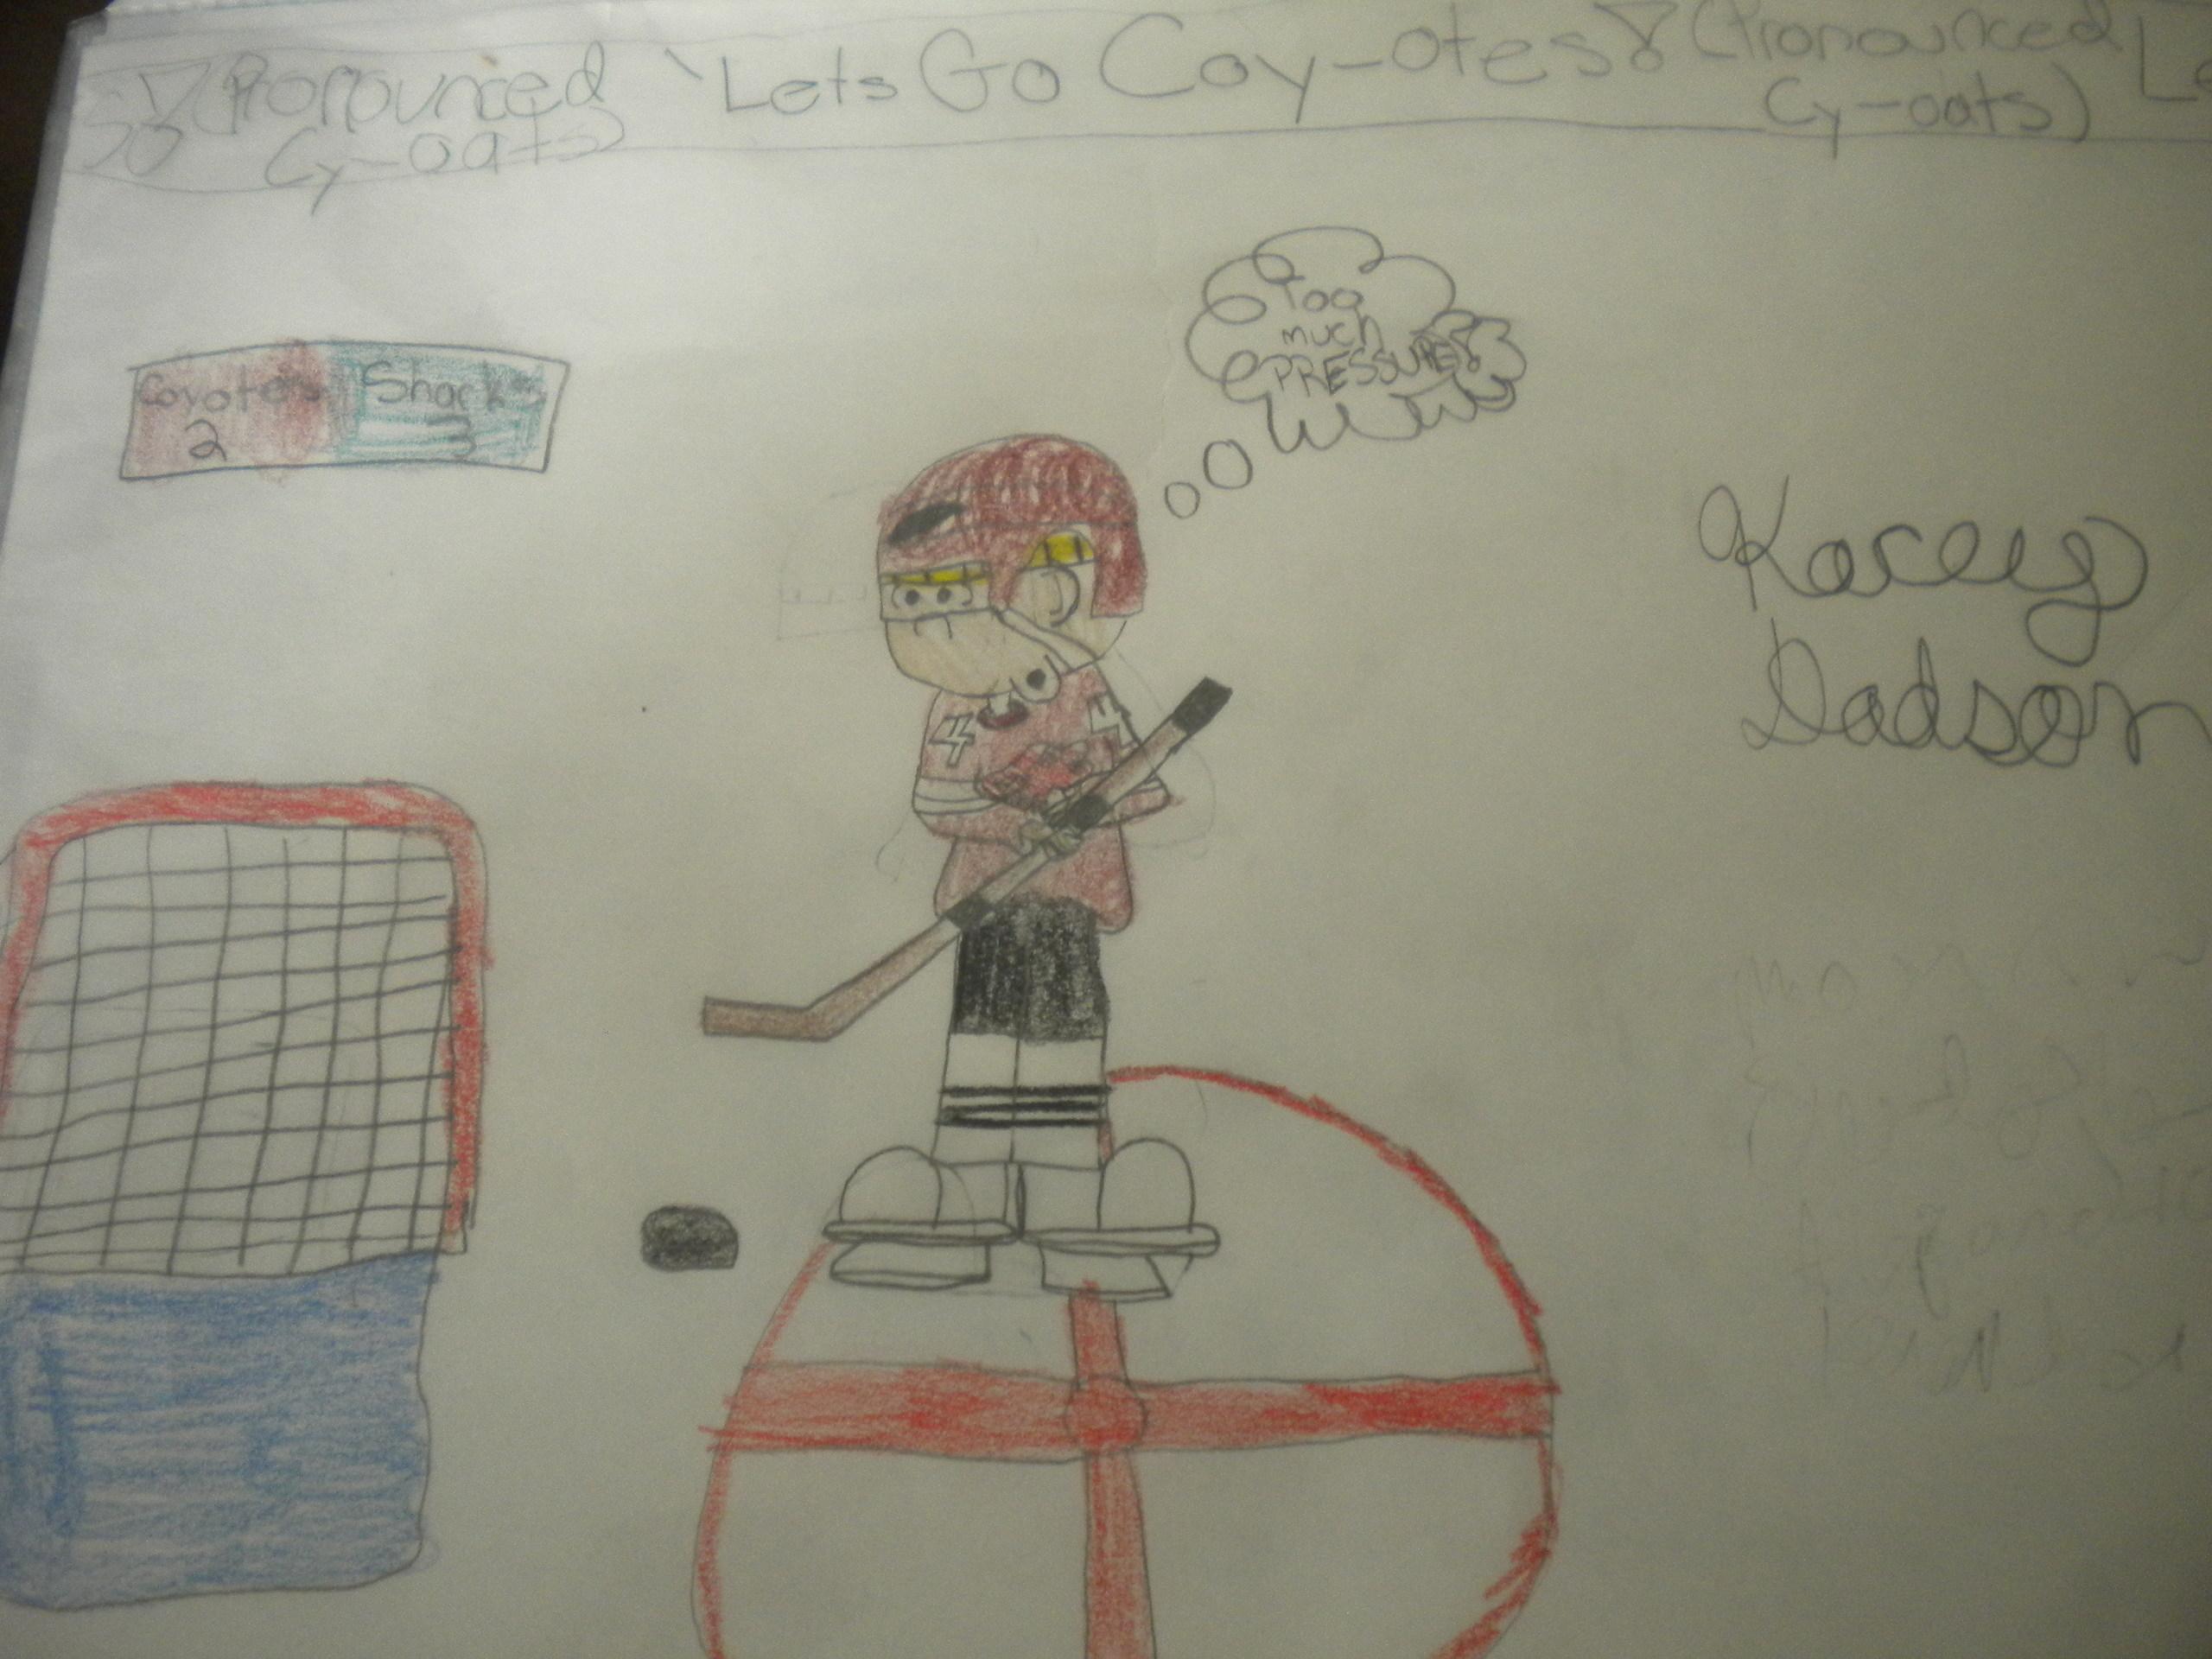 Wally the Hockey Player